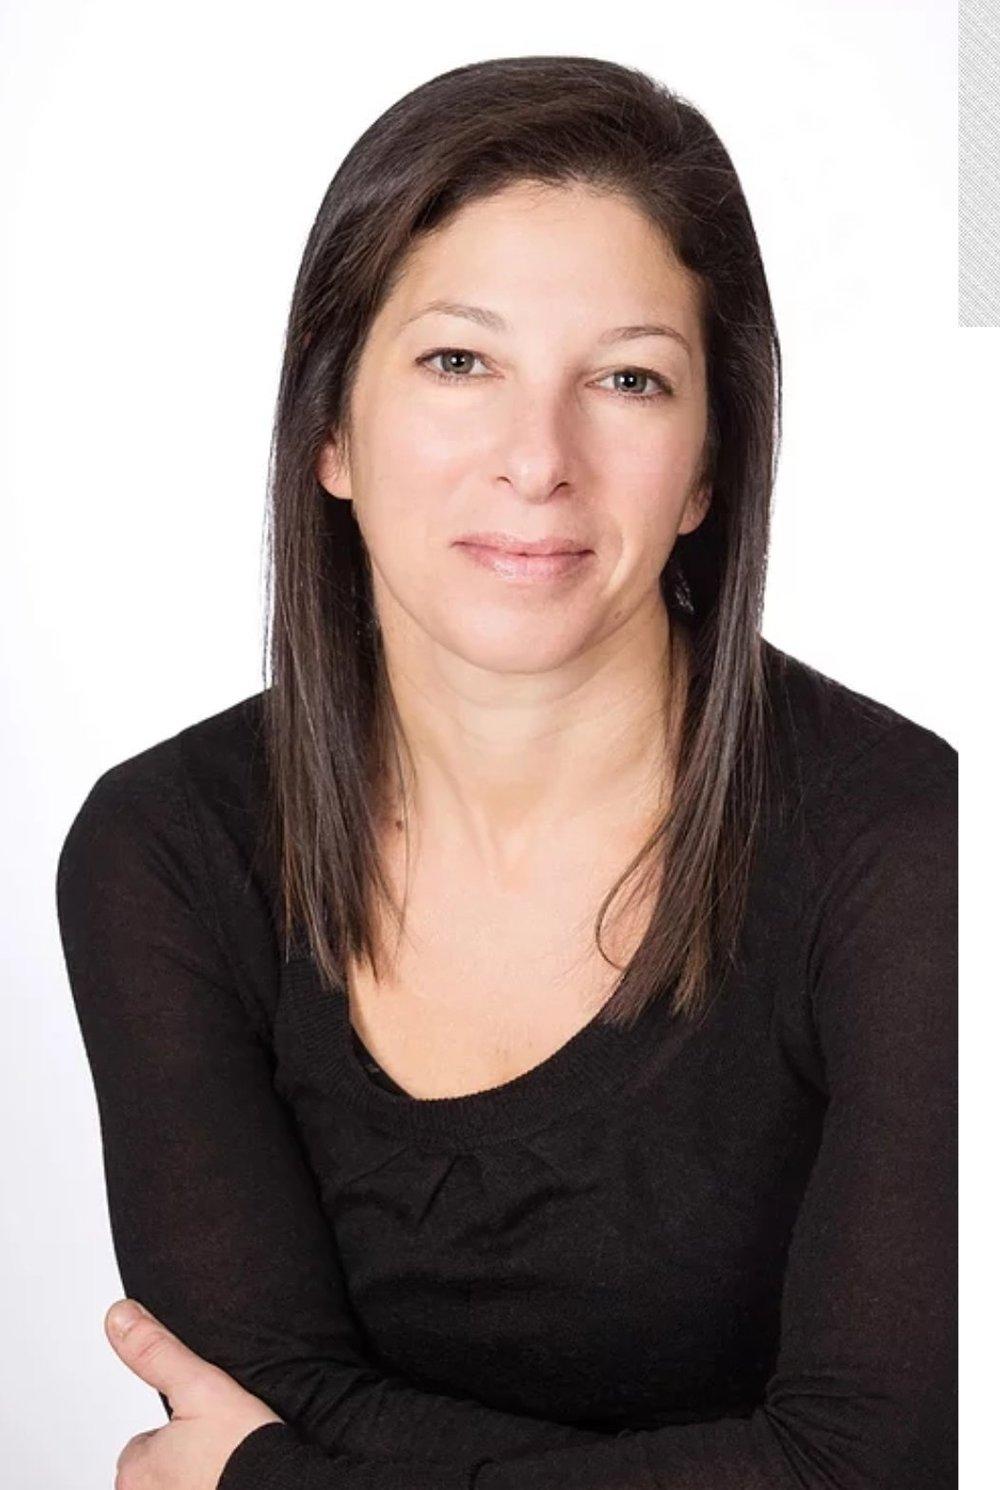 Margot Mostyn Toronto Registered Massage Therapist